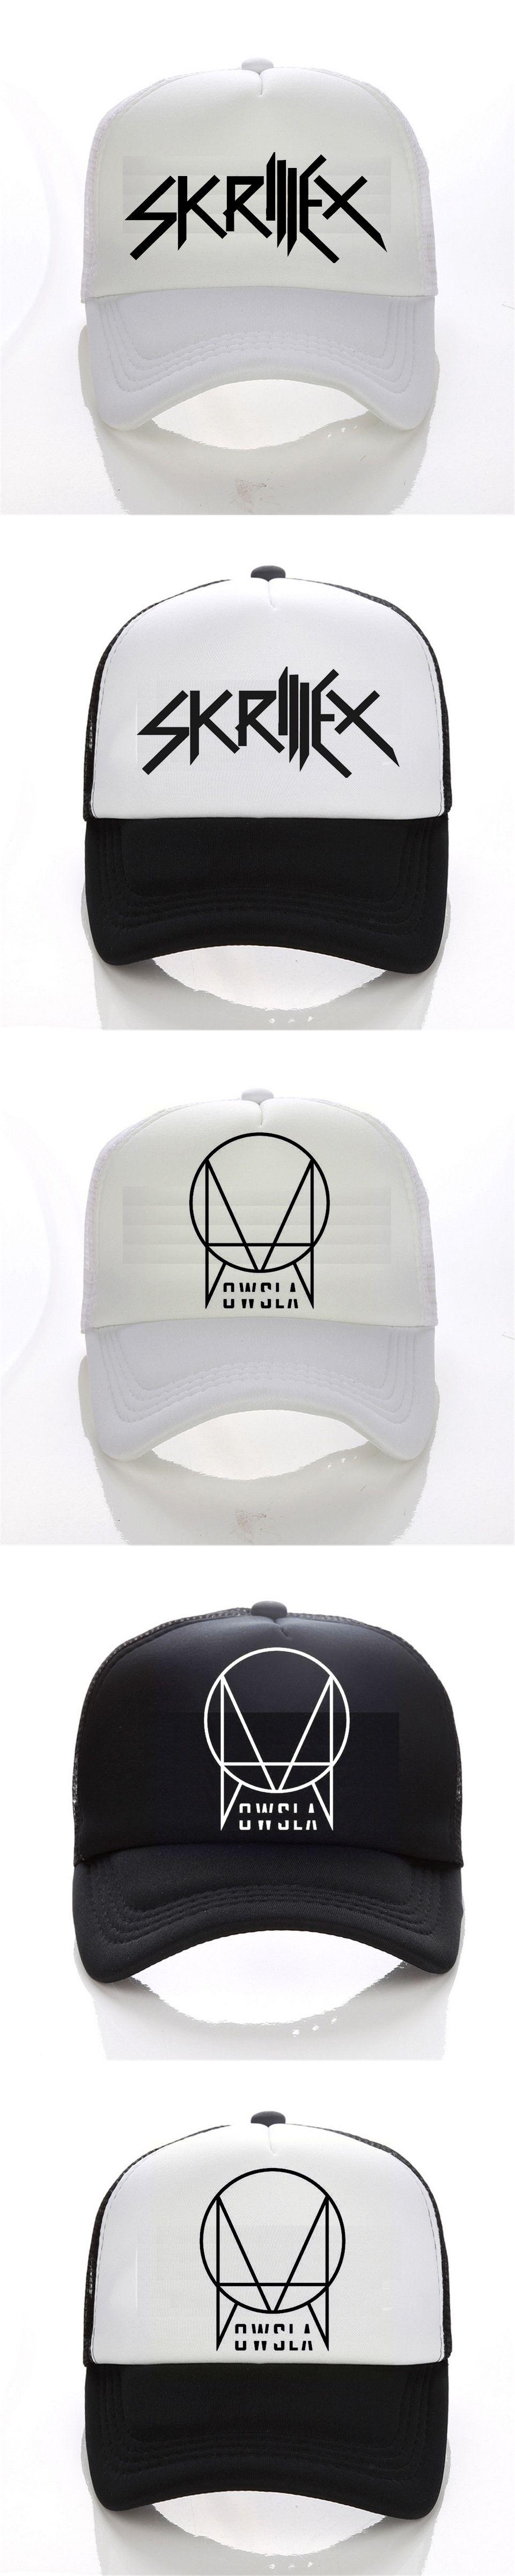 9d2e7befc64 Owsla Logo Unisex Adjustable Flat Bill Hat Baseball Cap Black Top ...